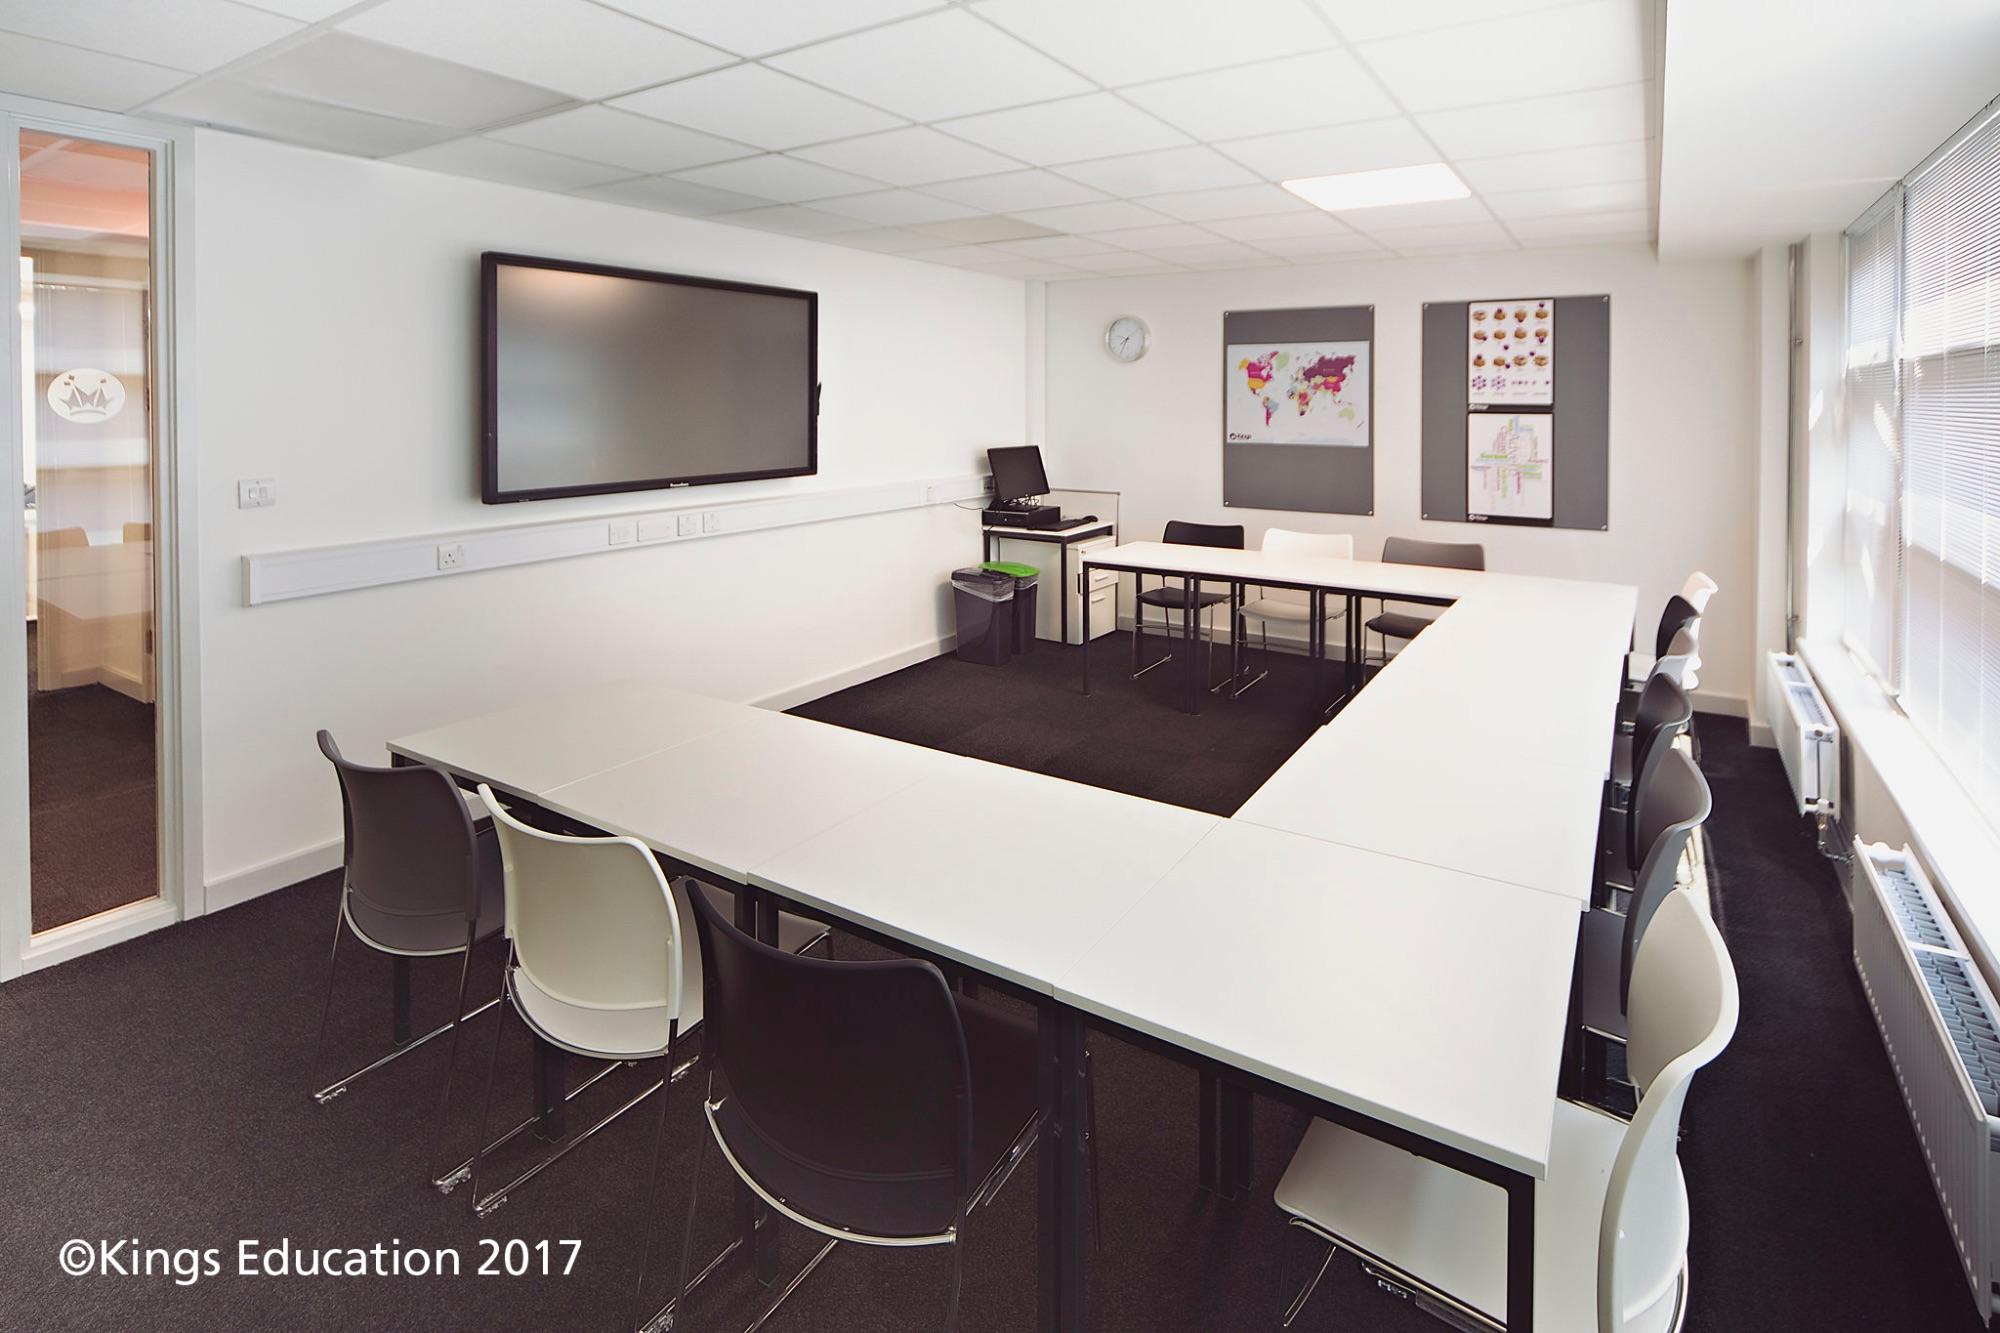 KingsBrighton(26) classroom